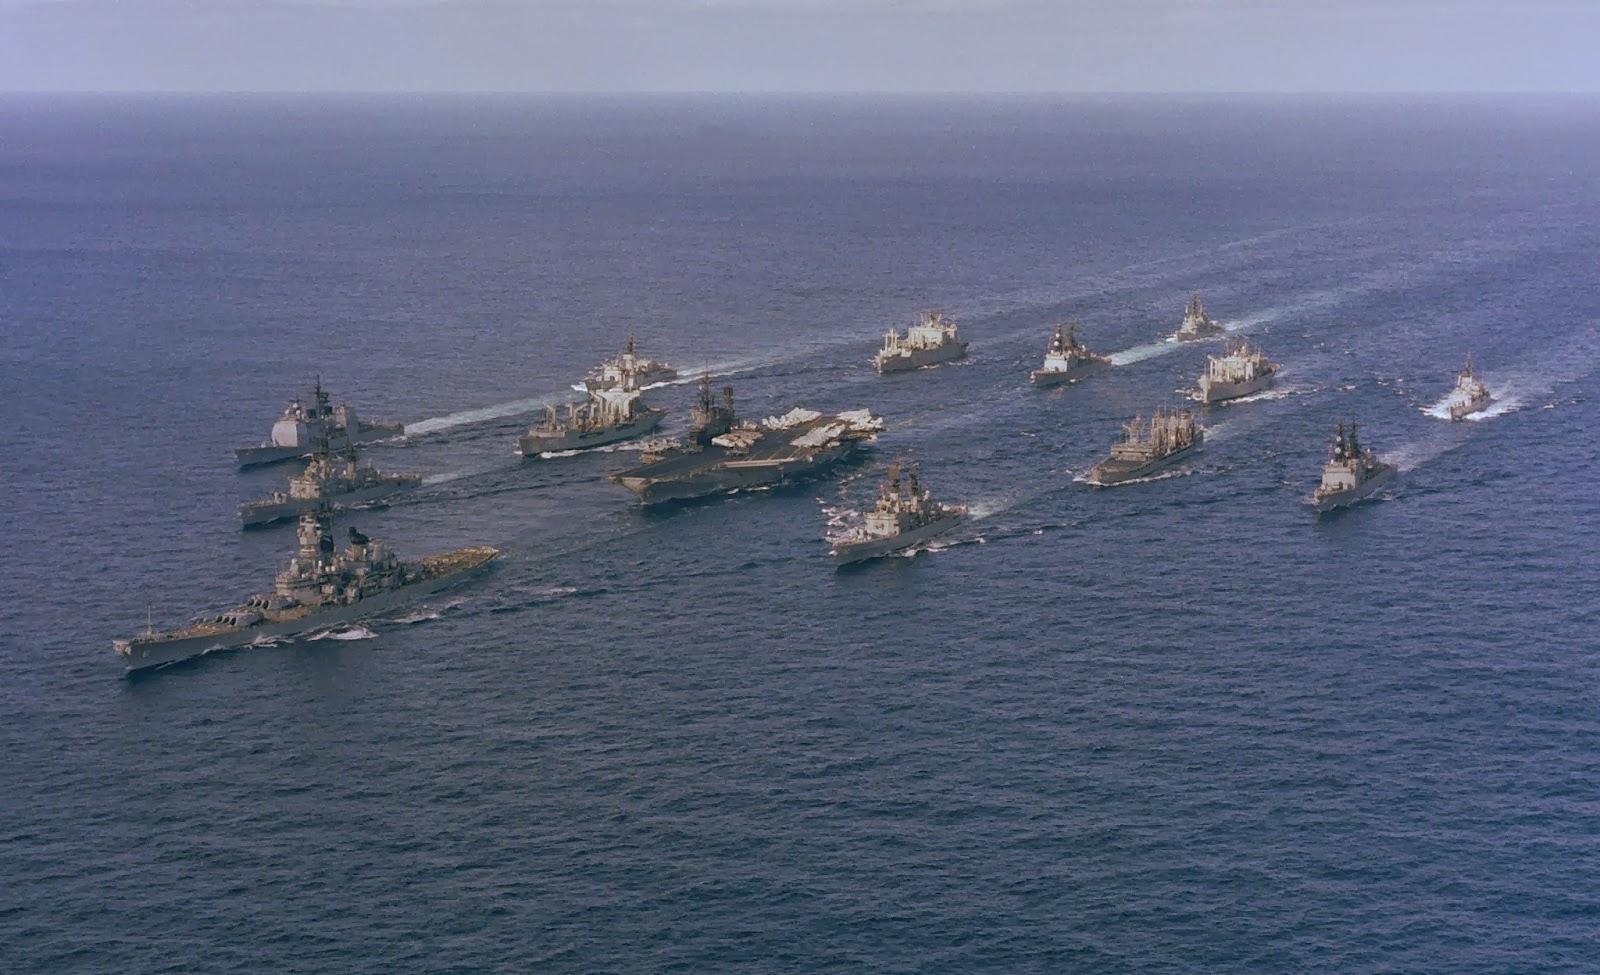 hight resolution of battleship battle group u s s iowa in lead